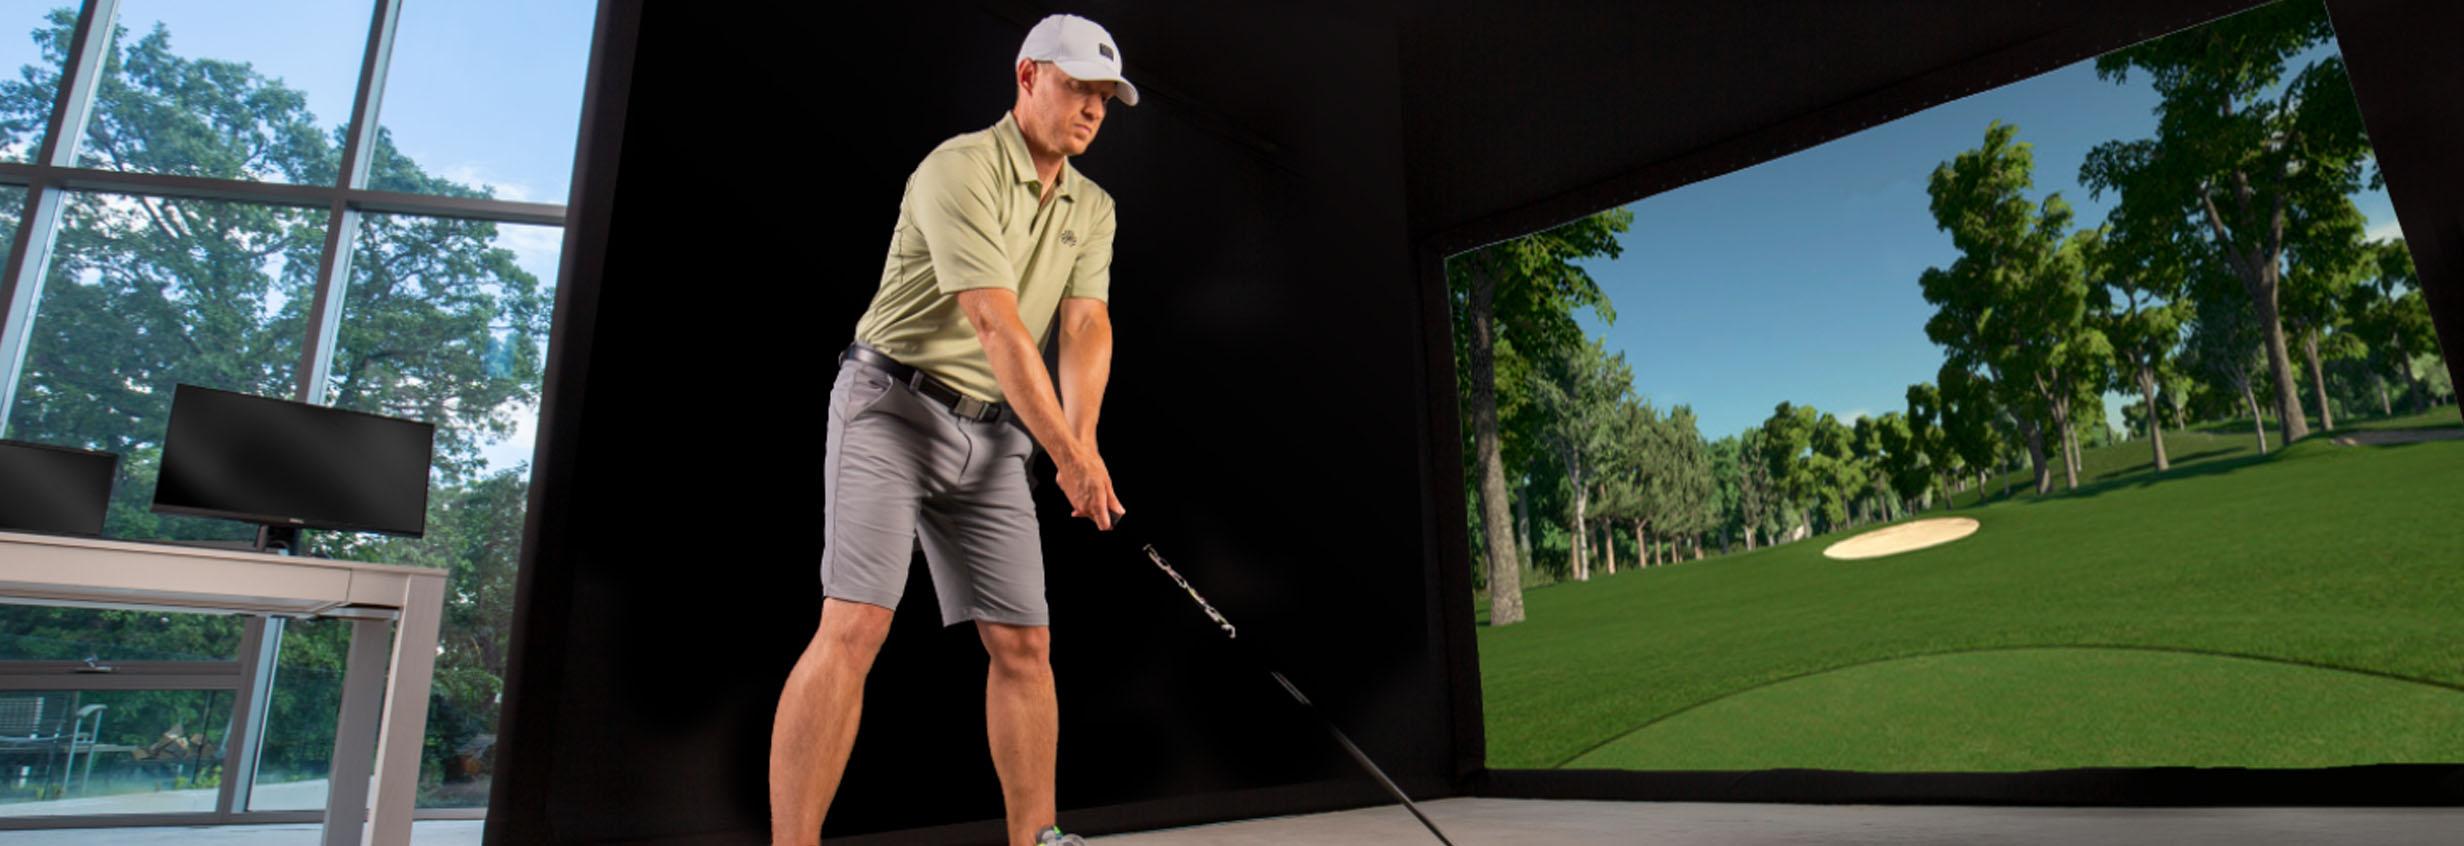 Golf Enclosures and Screens